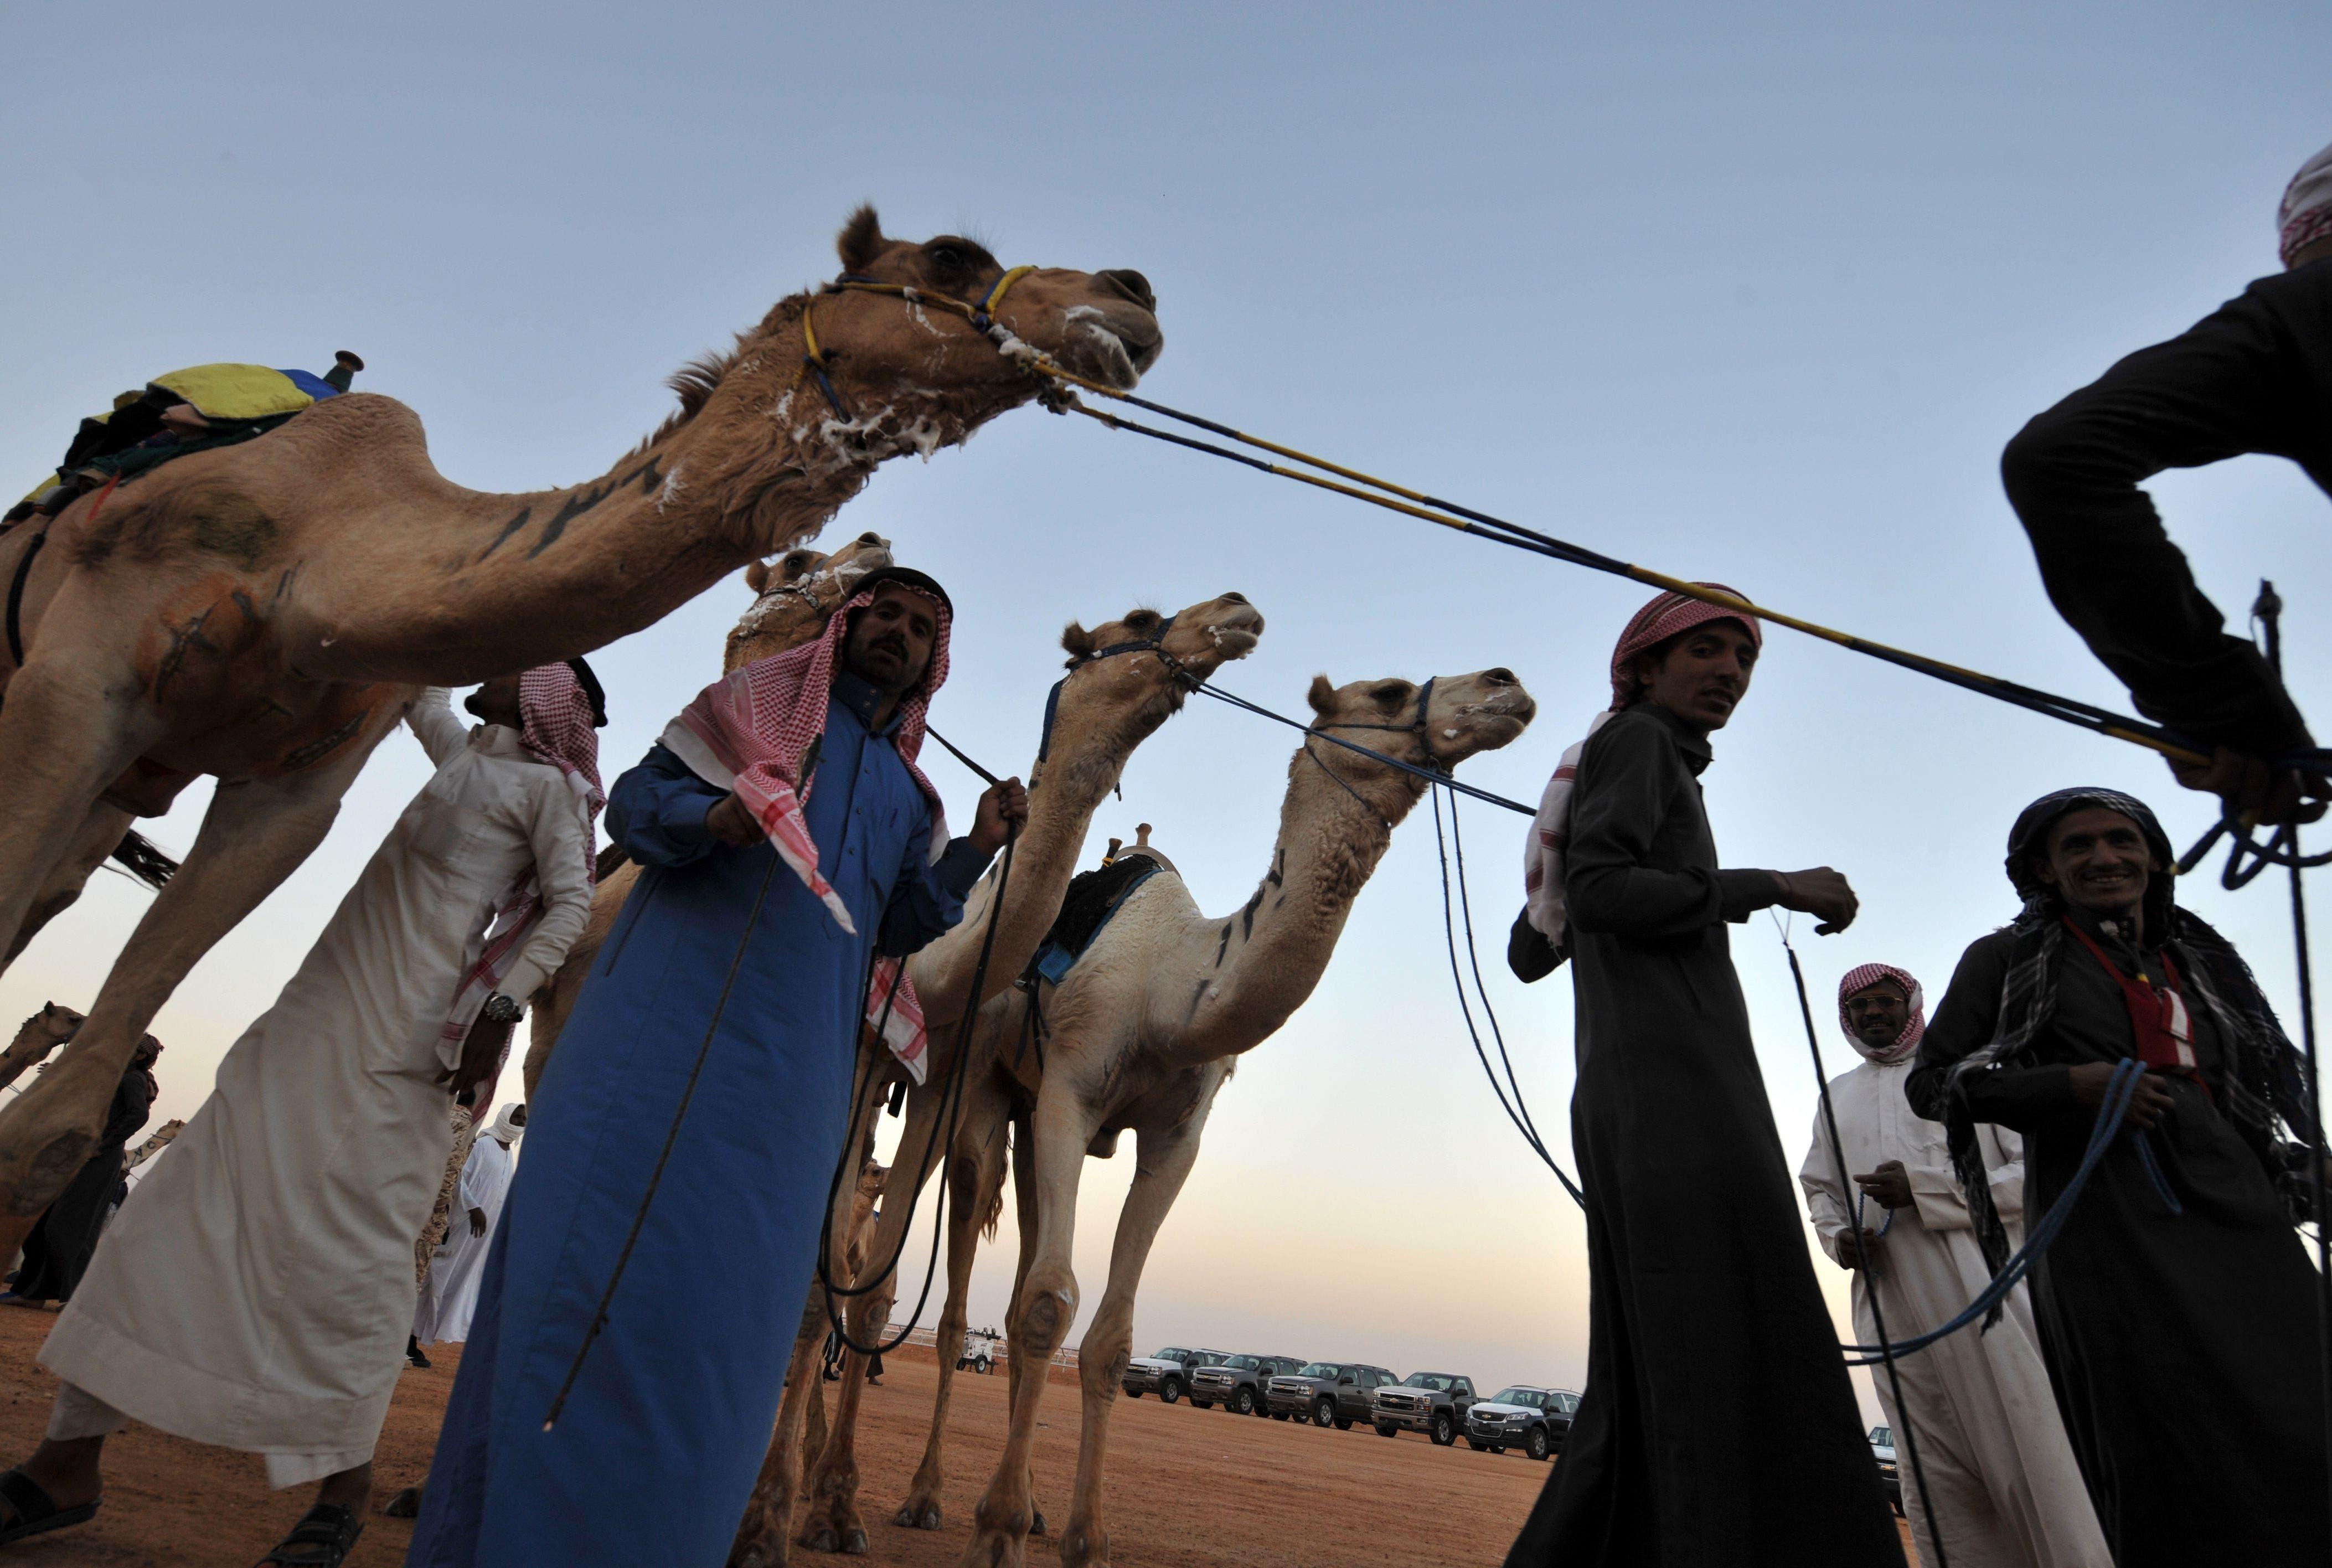 Riyadh Camel Race